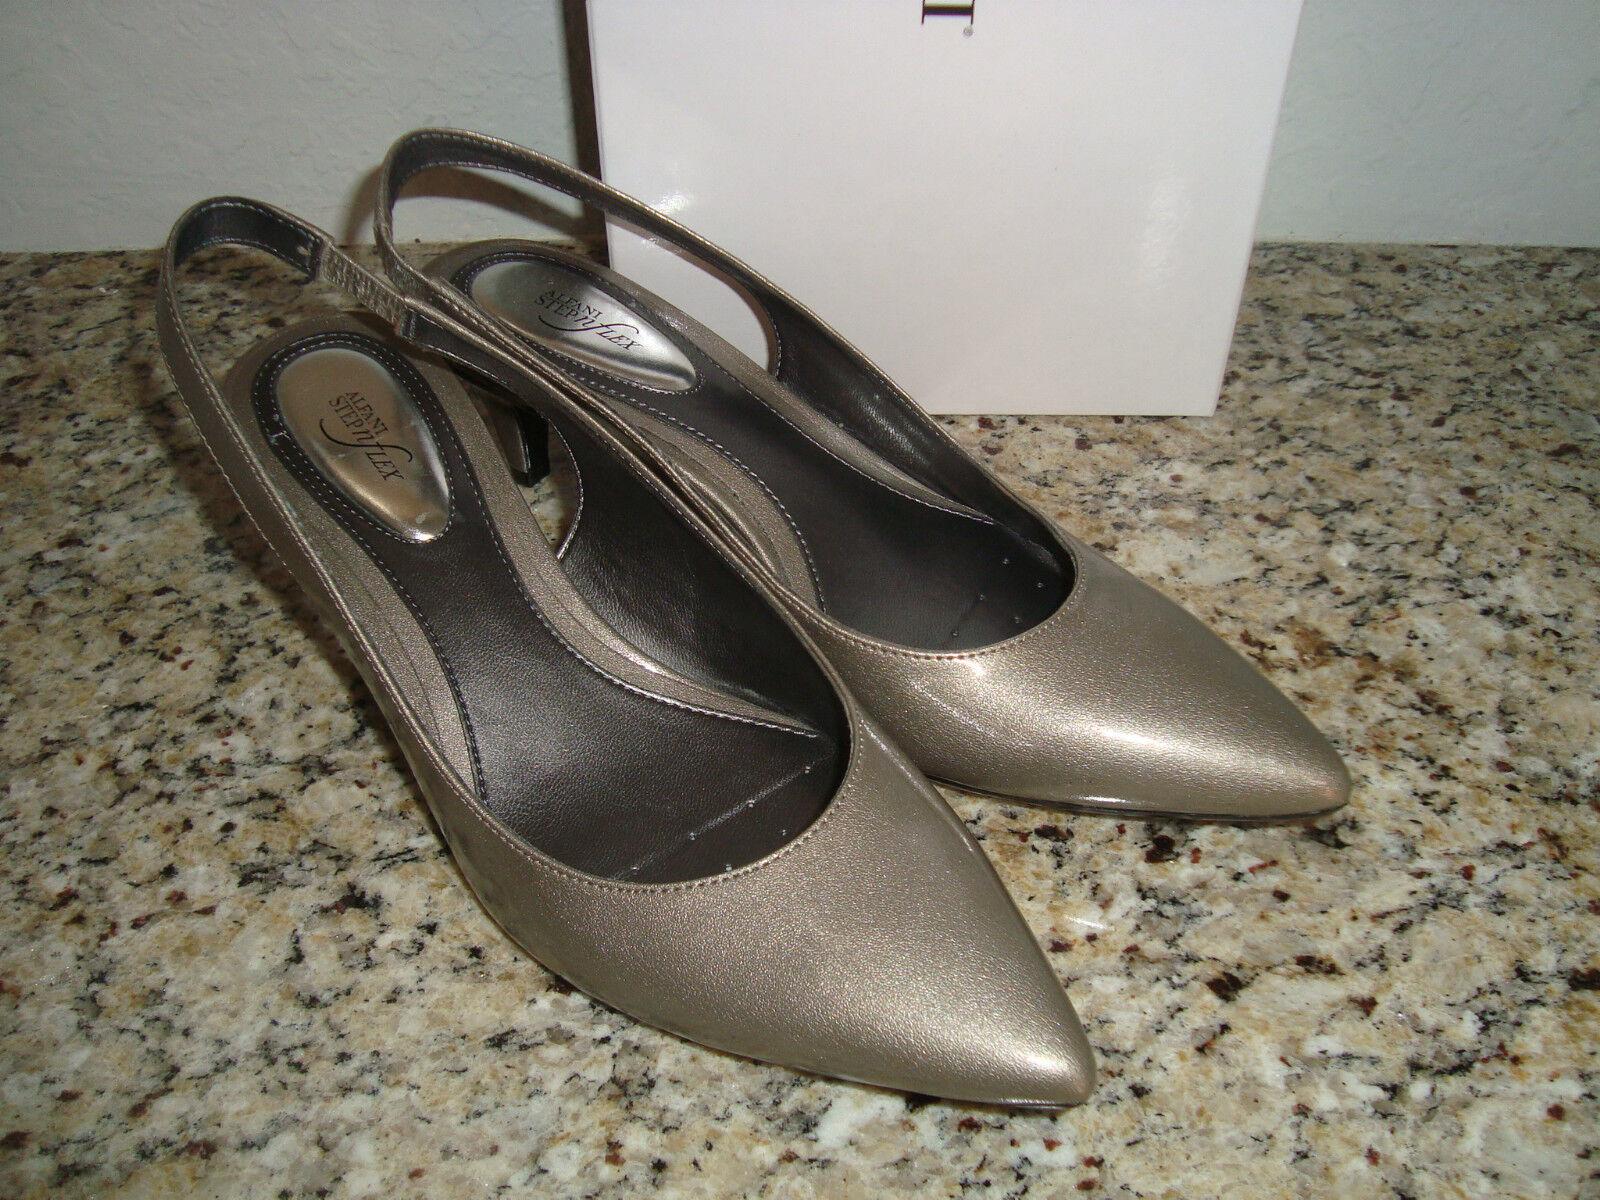 NEU Alfani Rainegry Damenschuhe Stormy Gray Schuhes Heels 6.5 Medium